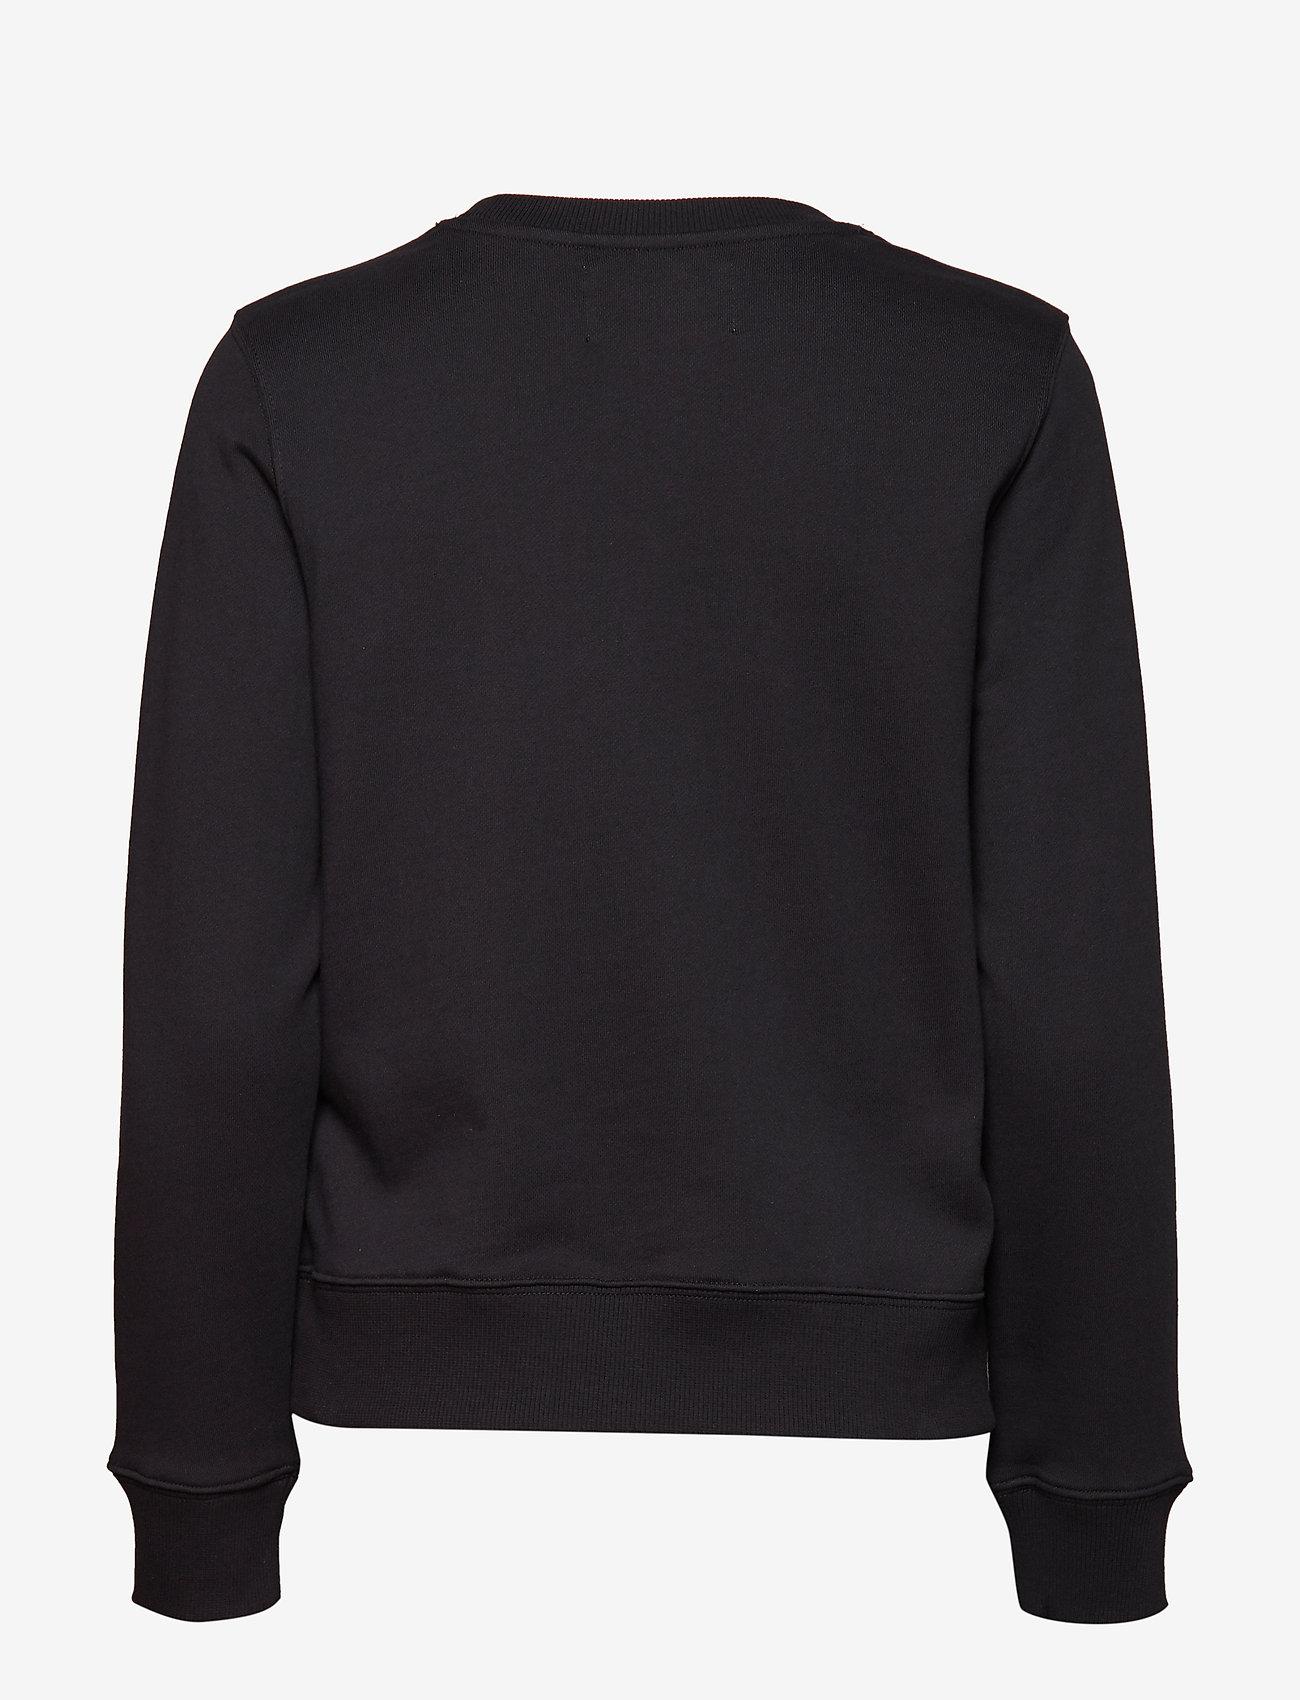 Calvin Klein Jeans - INSTITUTIONAL CORE L - sweatshirts - ck black - 1